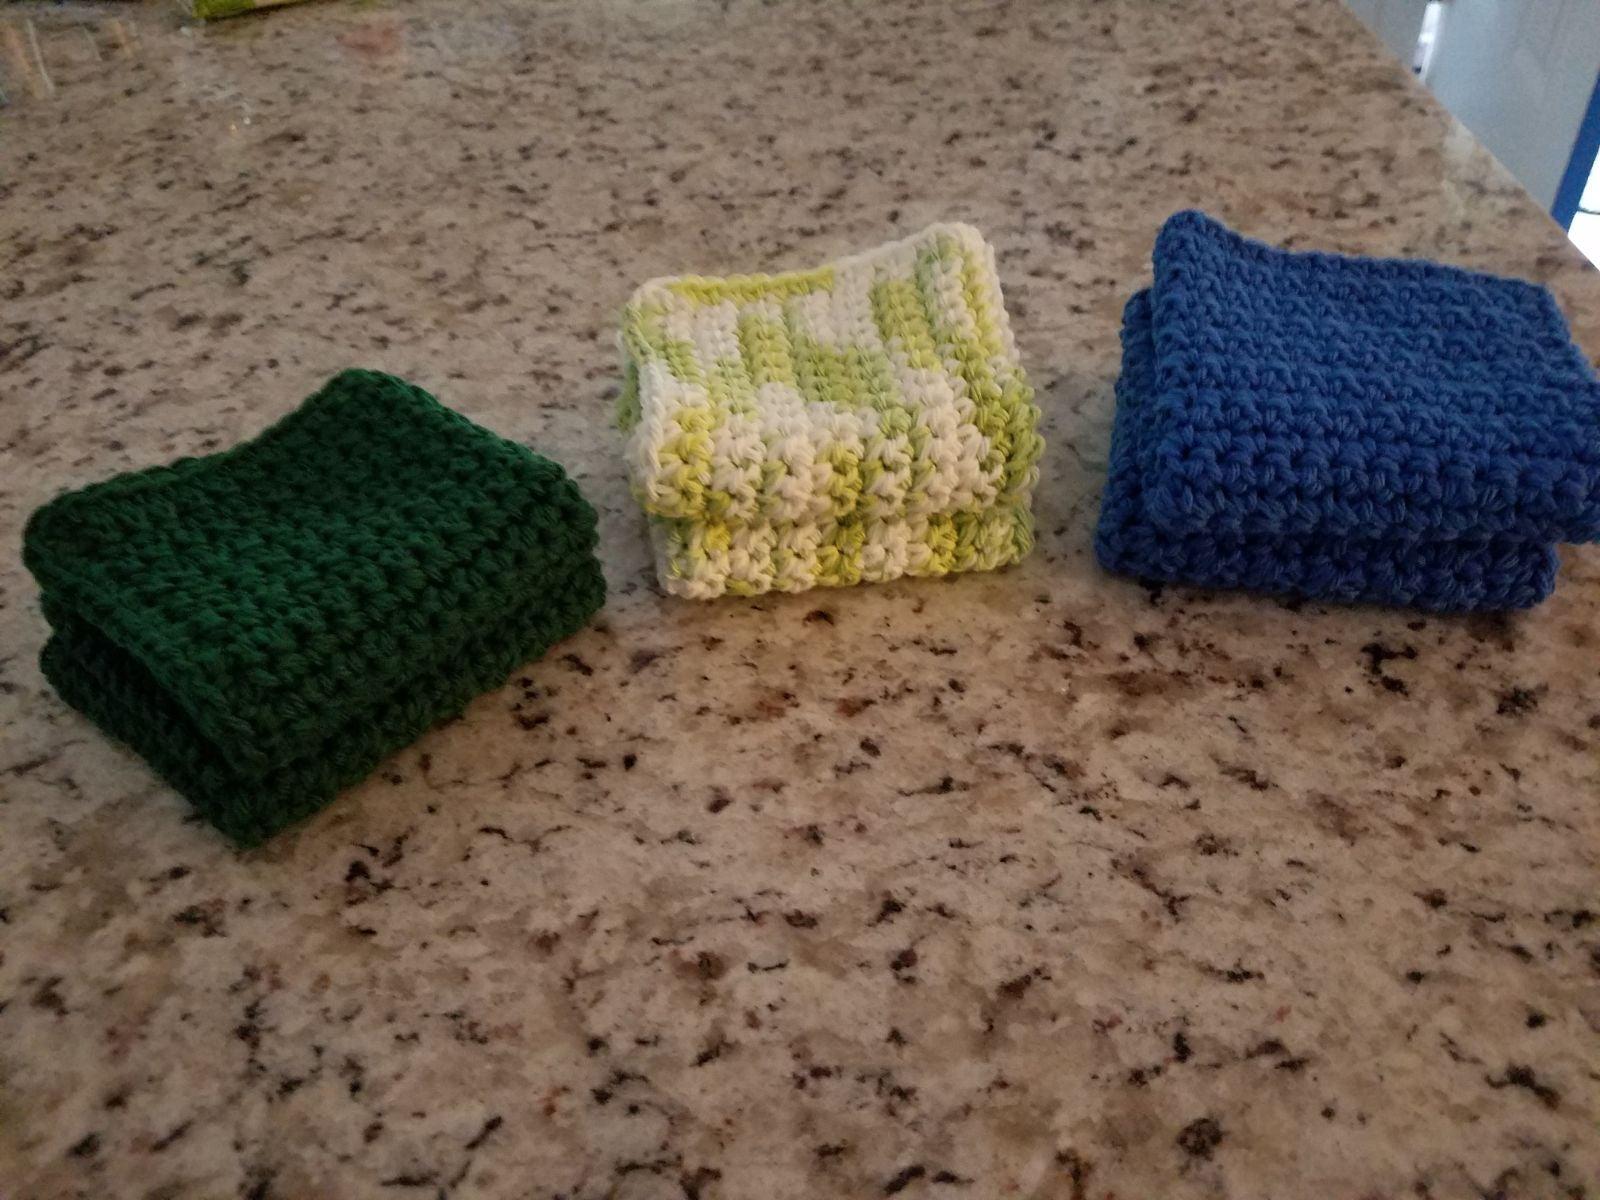 Set of 4 handmade crocheted dishcloths